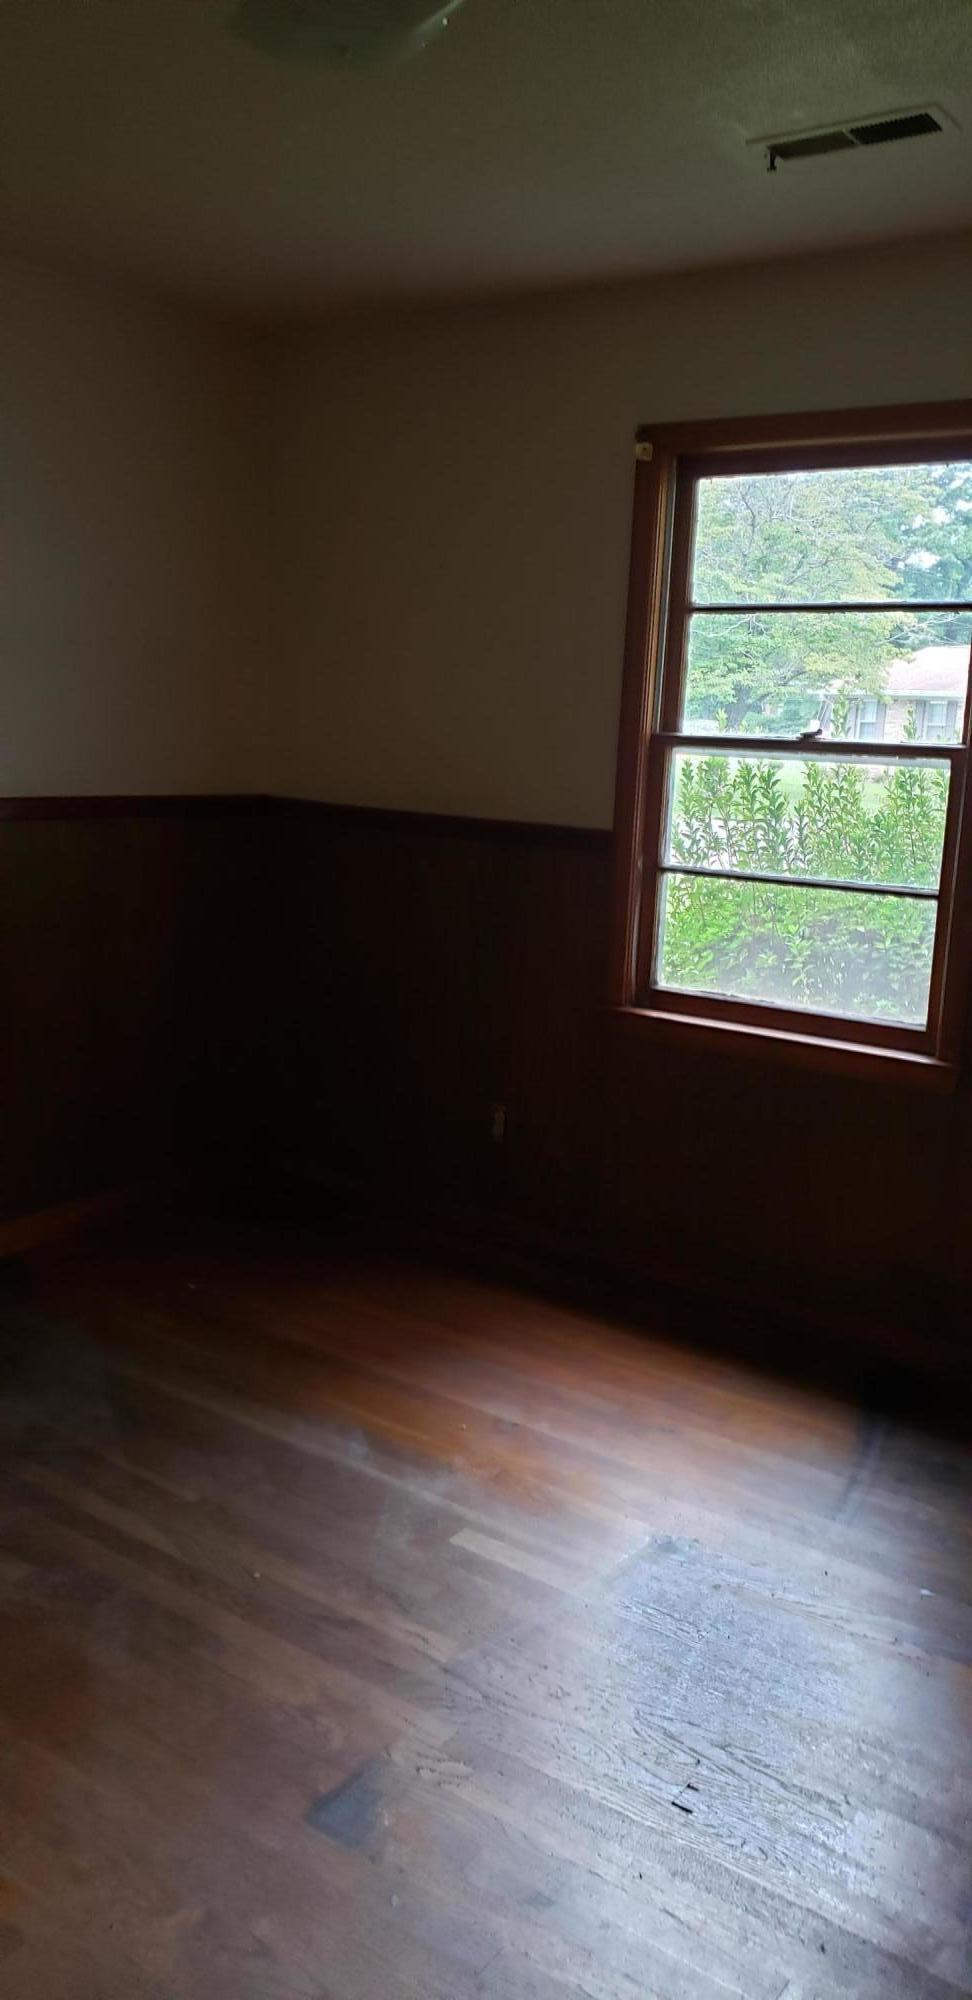 Owens Homes For Sale - 234 Owens, Summerville, SC - 8